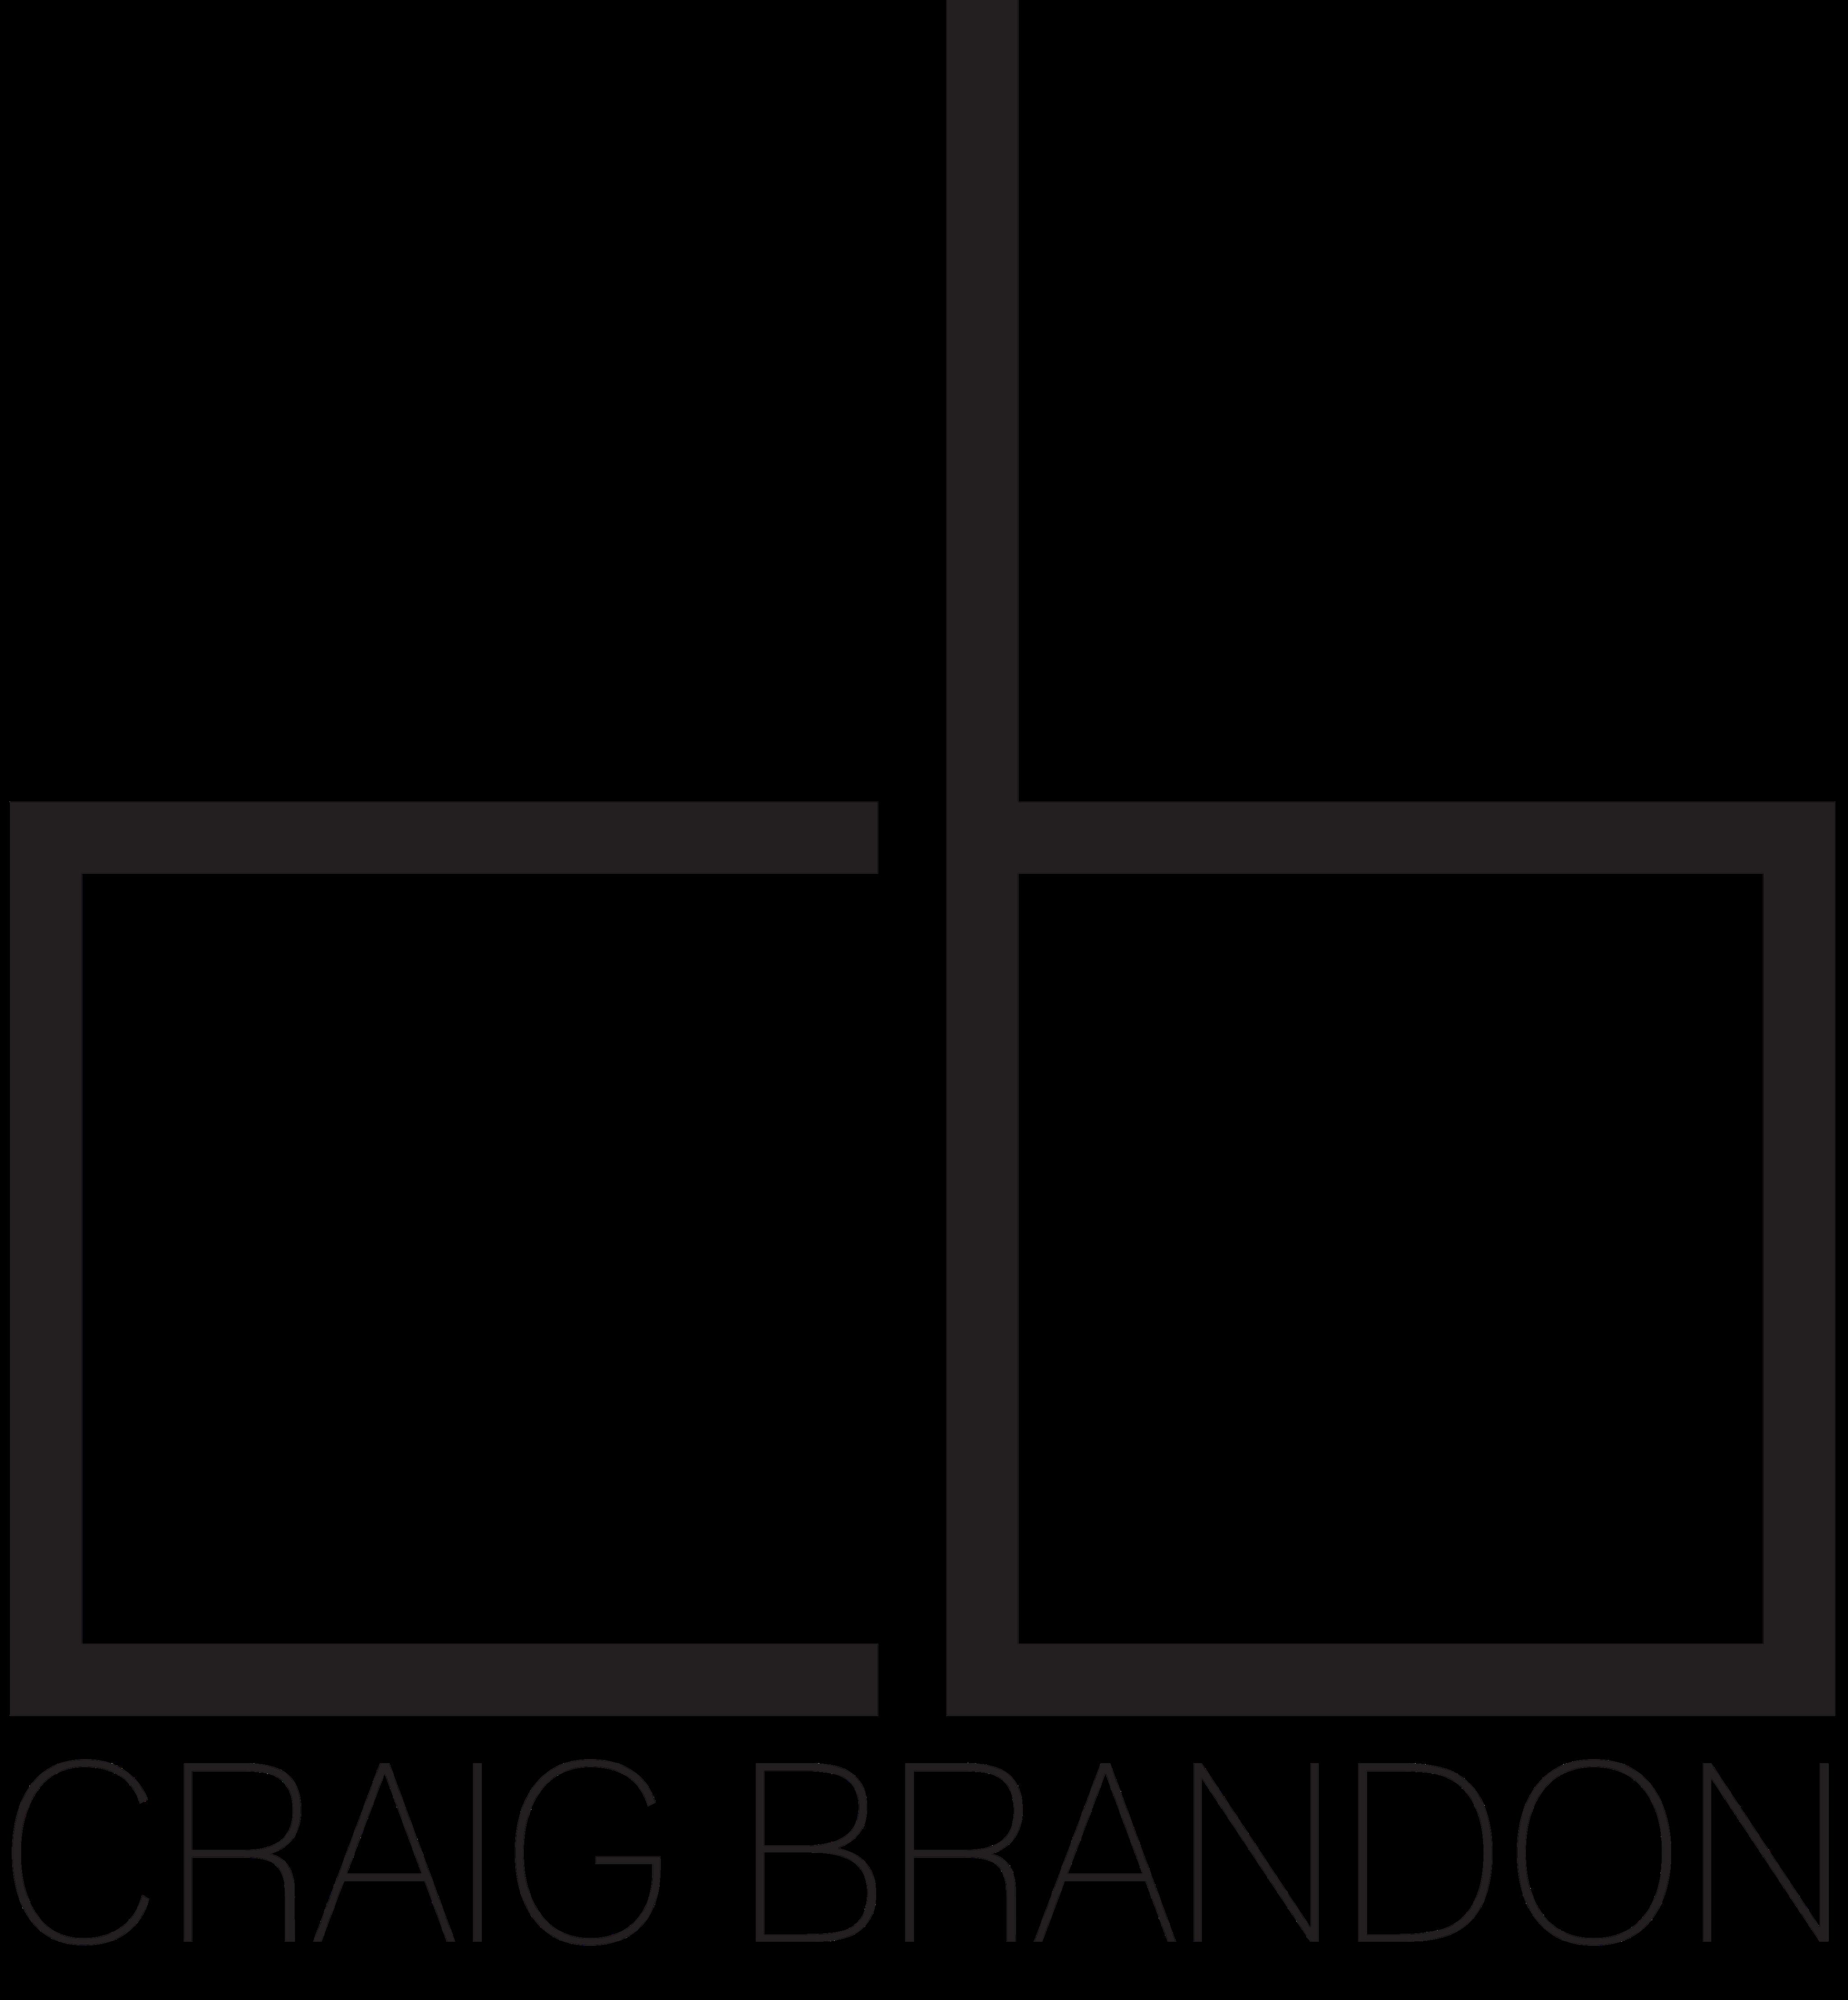 CRAIG BRANDON